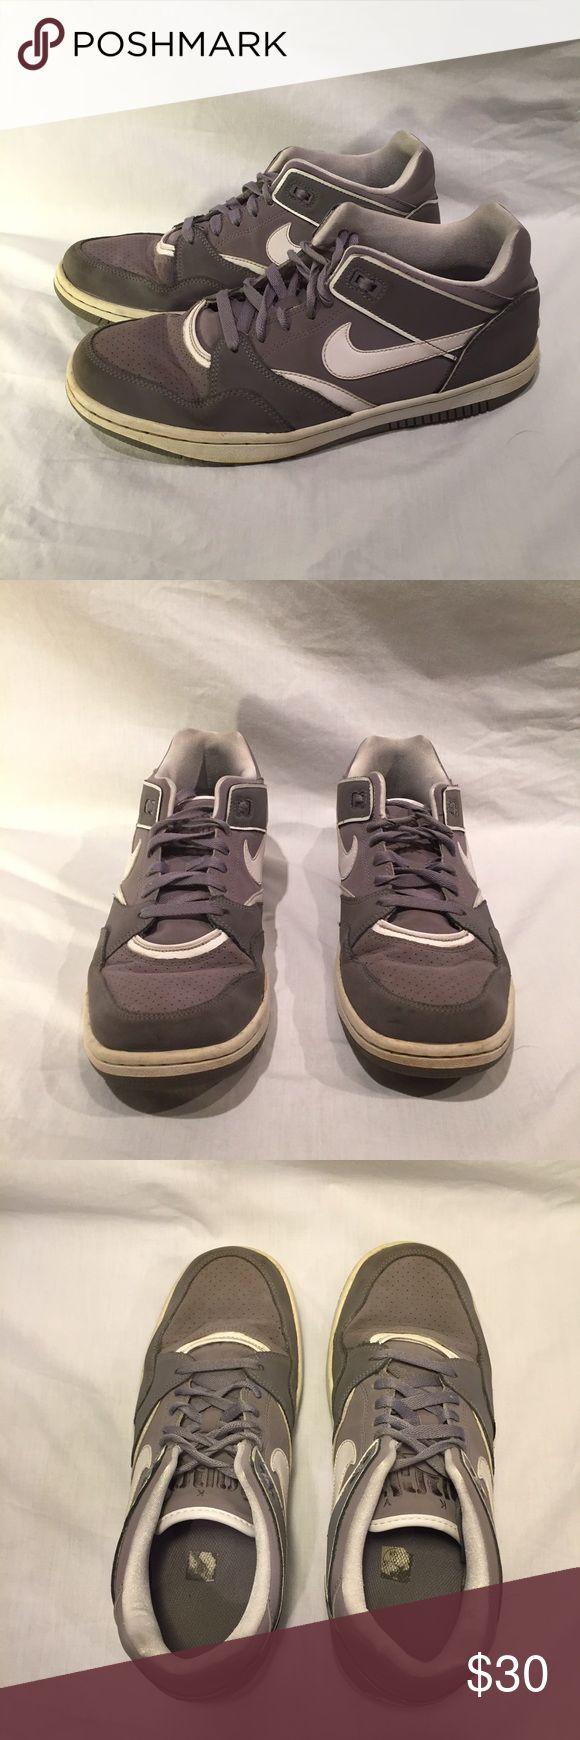 Men's Nike sneakers Selling boyfriend's sneakers. Nike basketball shoes. Gently worn. Nike Shoes Athletic Shoes